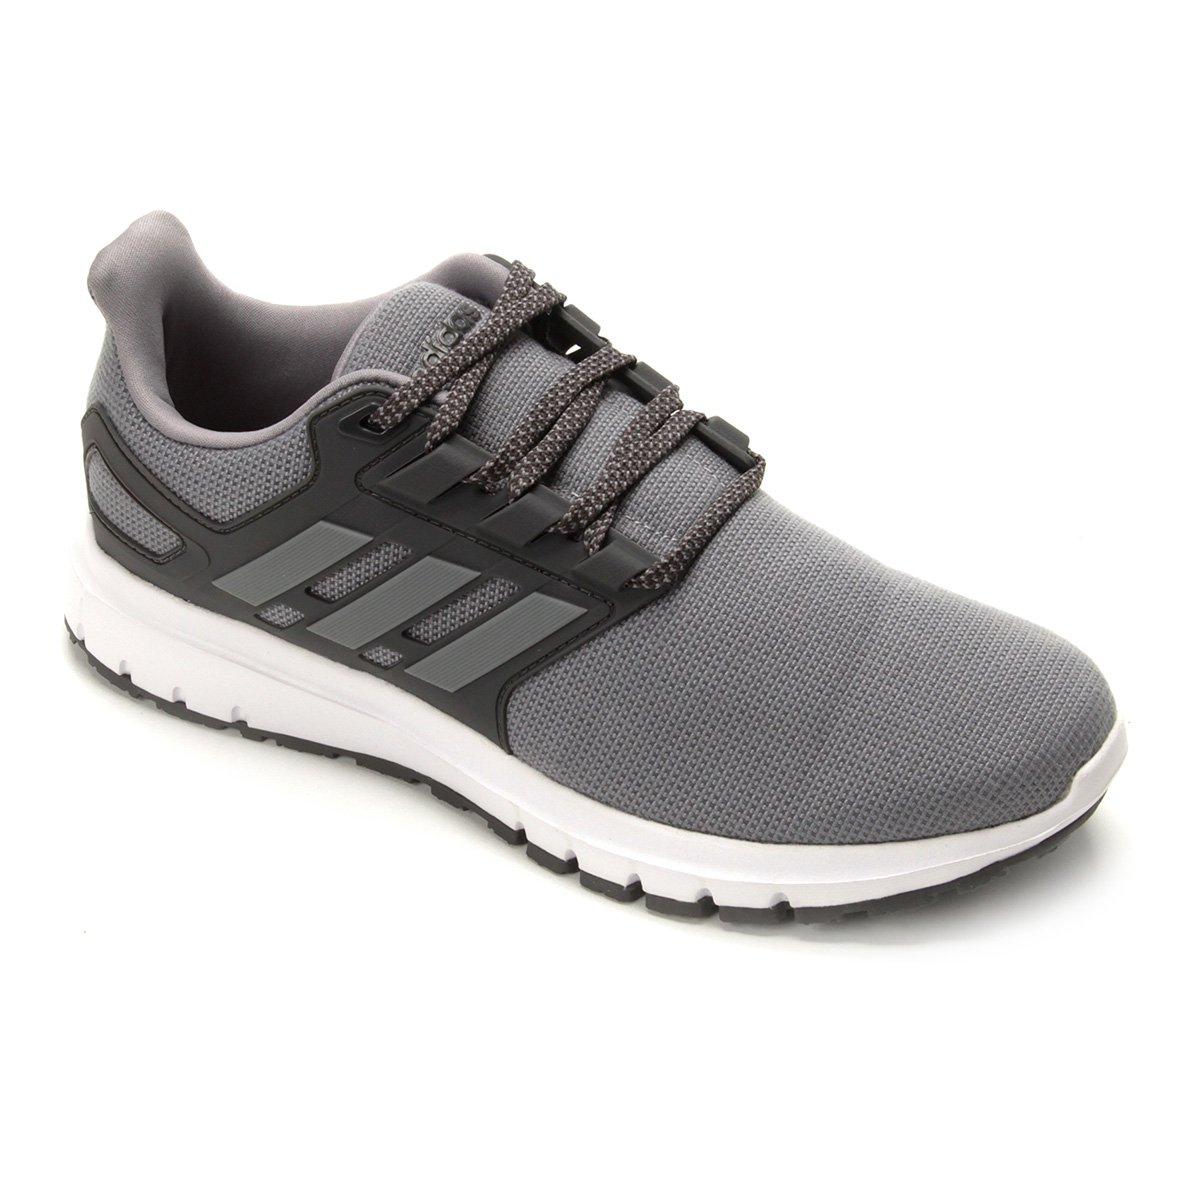 0b61036d3d7 Tênis Adidas Energy Cloud 2 Masculino - Cinza - Compre Agora